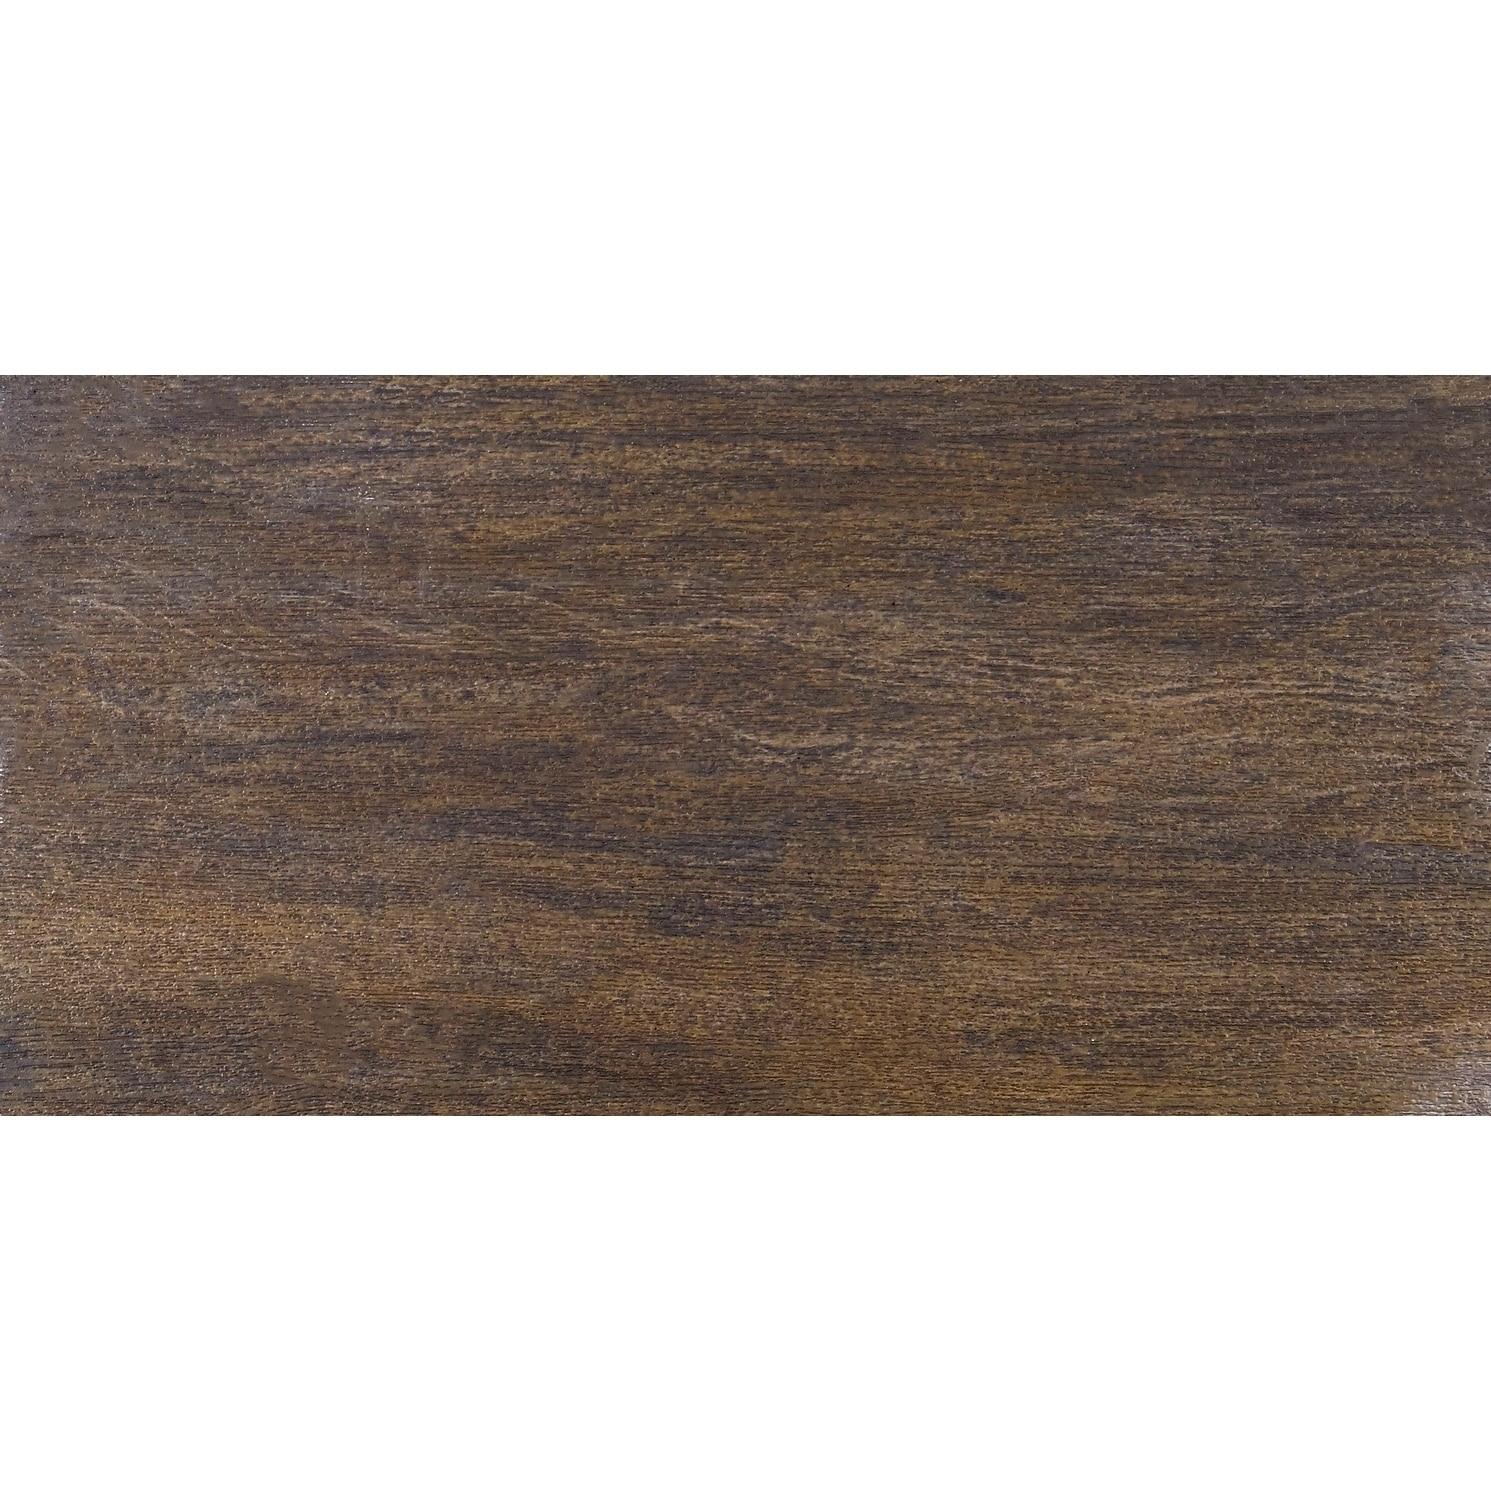 Shop Natural Wood Look 12x24 Inch Porcelain Floor Tile In Suspension